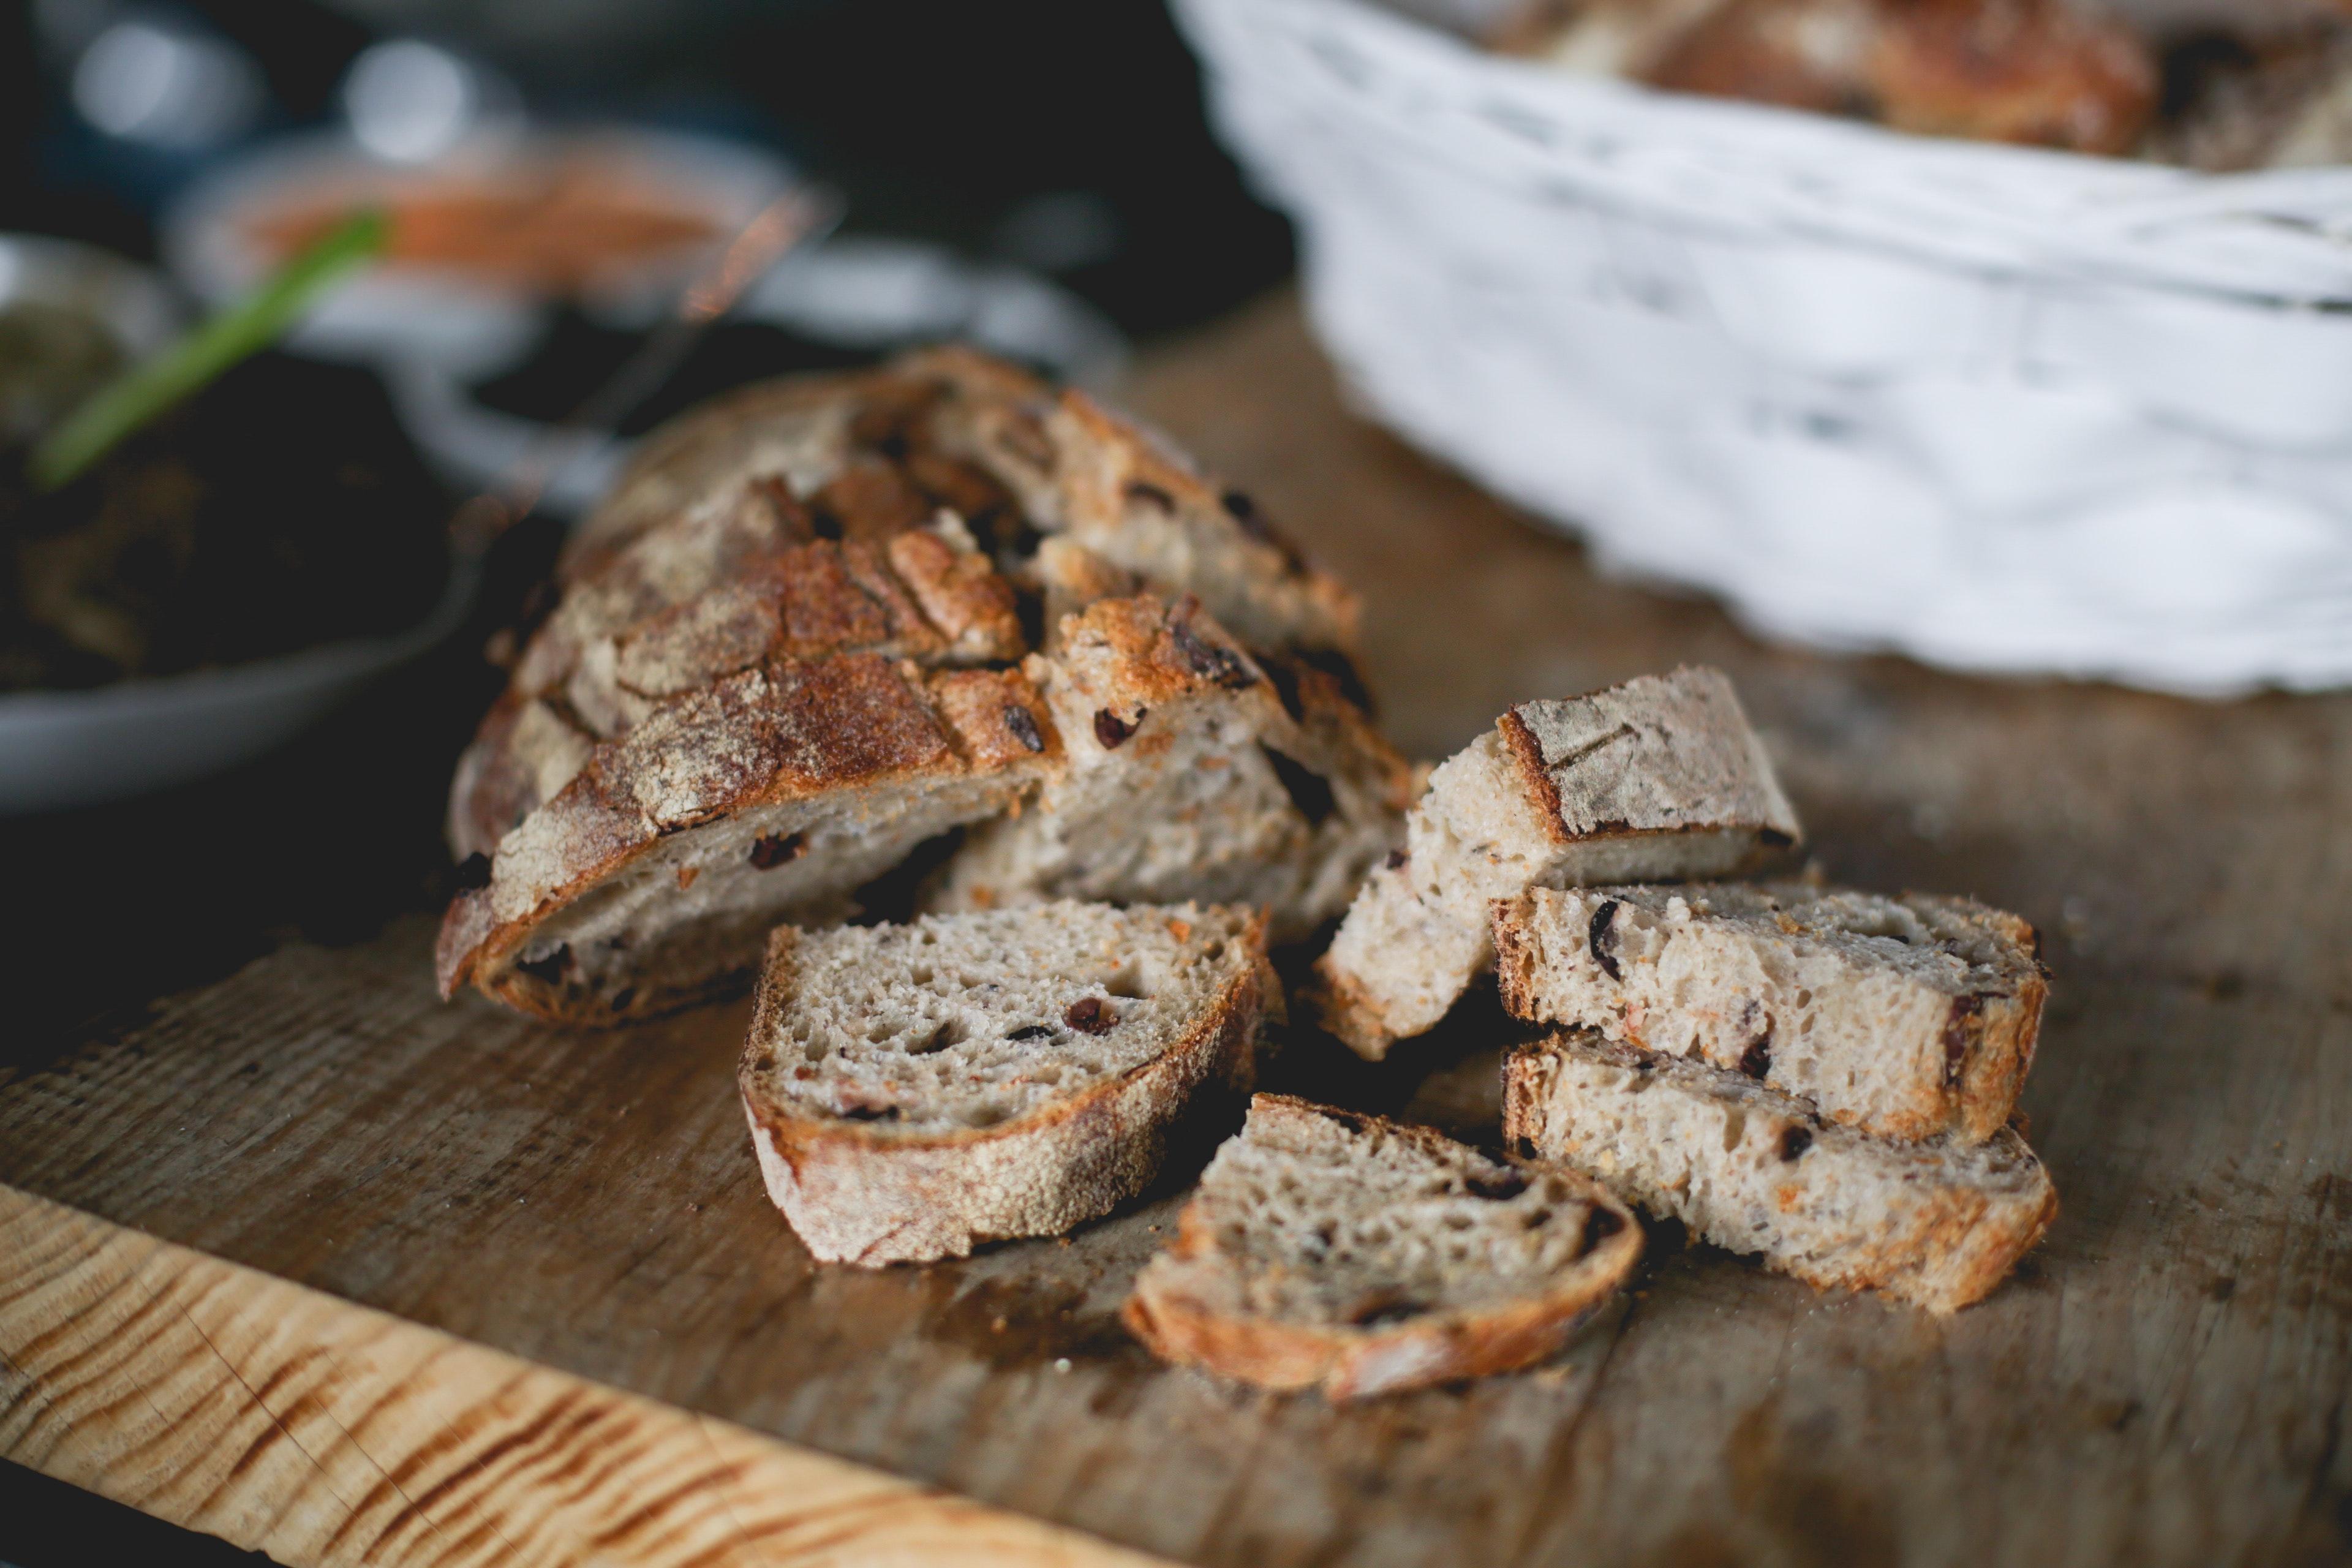 baked-goods-blur-bread-1555813